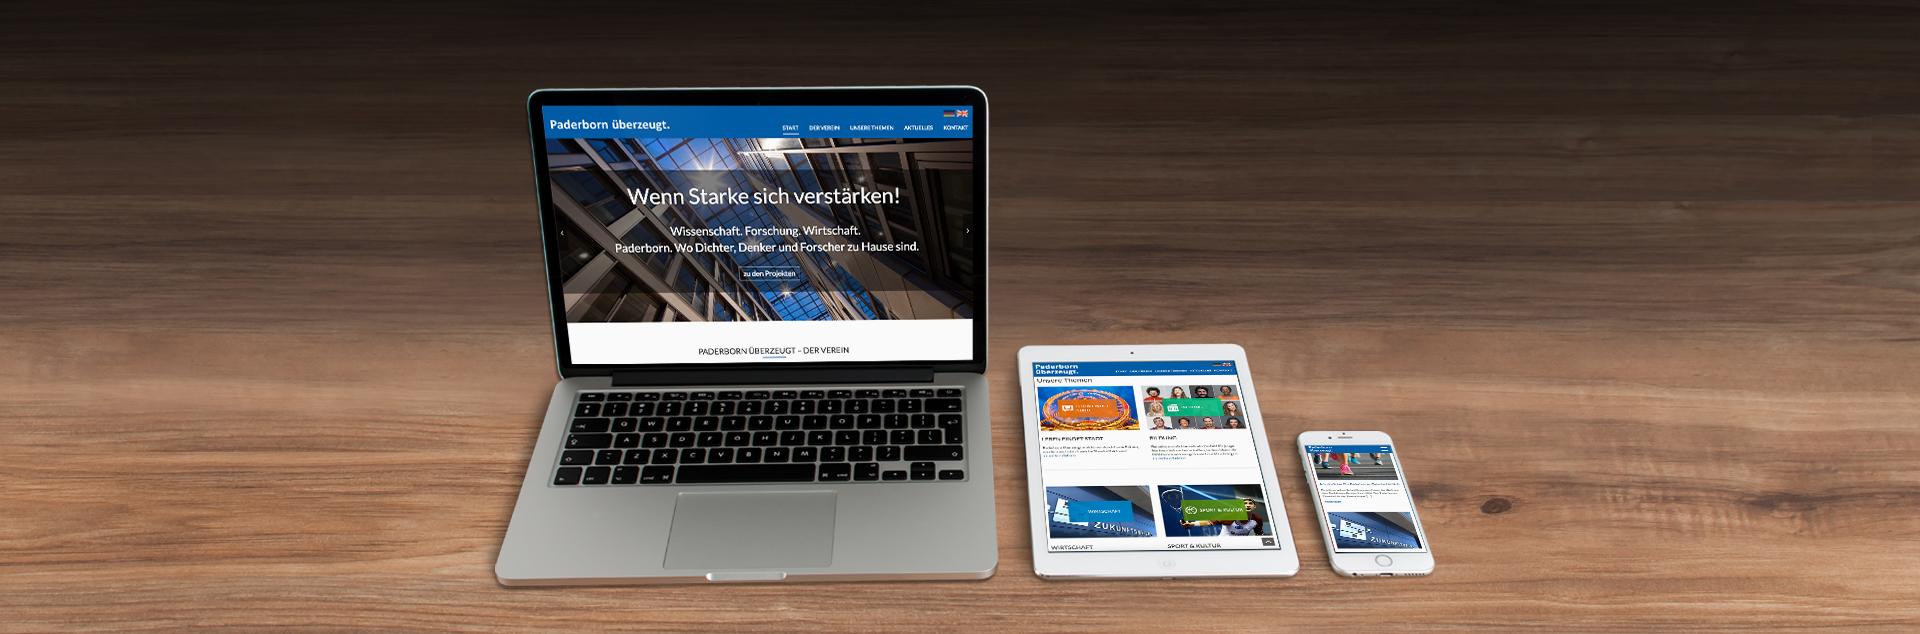 paderborn-ueberzeugt-website